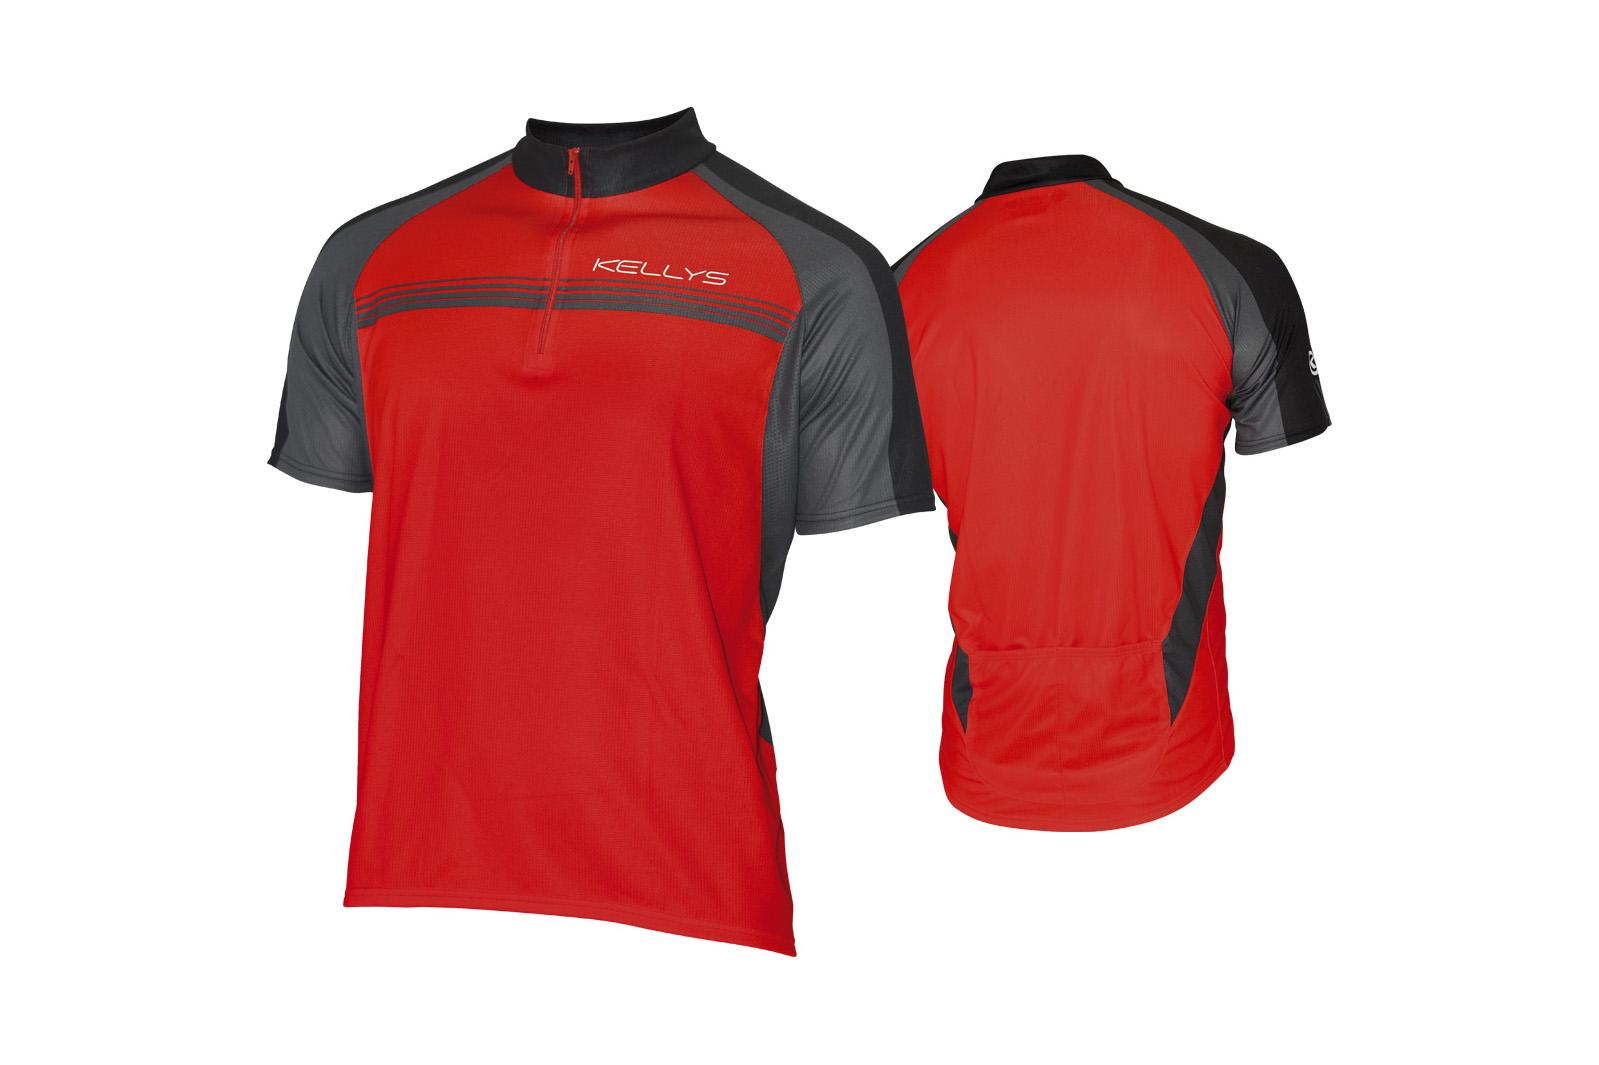 Pánský dres KELLYS PRO Sport, vel. M, červená, krátký rukáv (Pánský cyklistický dres KELLYS, vel. M, krátký rukáv, barva červená dle vyobrazení!)